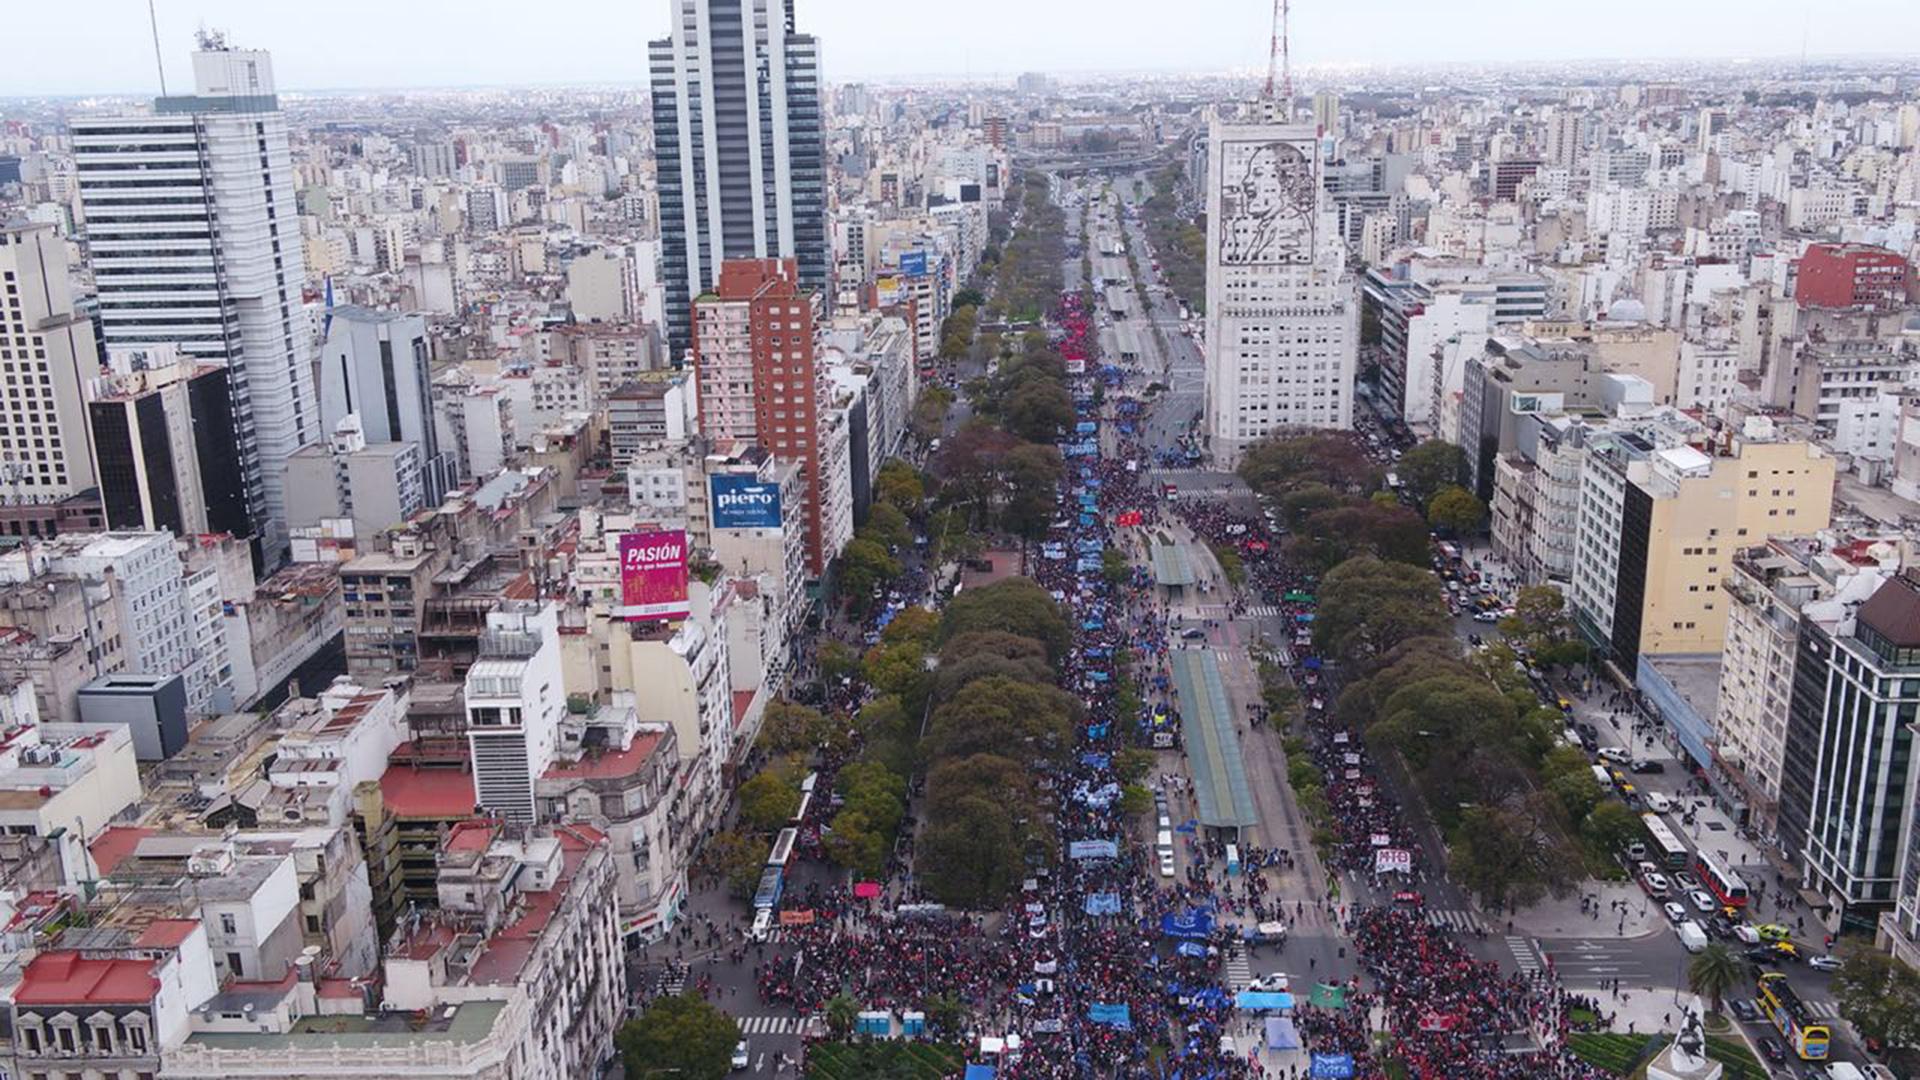 La marcha pobló la mayor parte de la avenida 9 de Julio